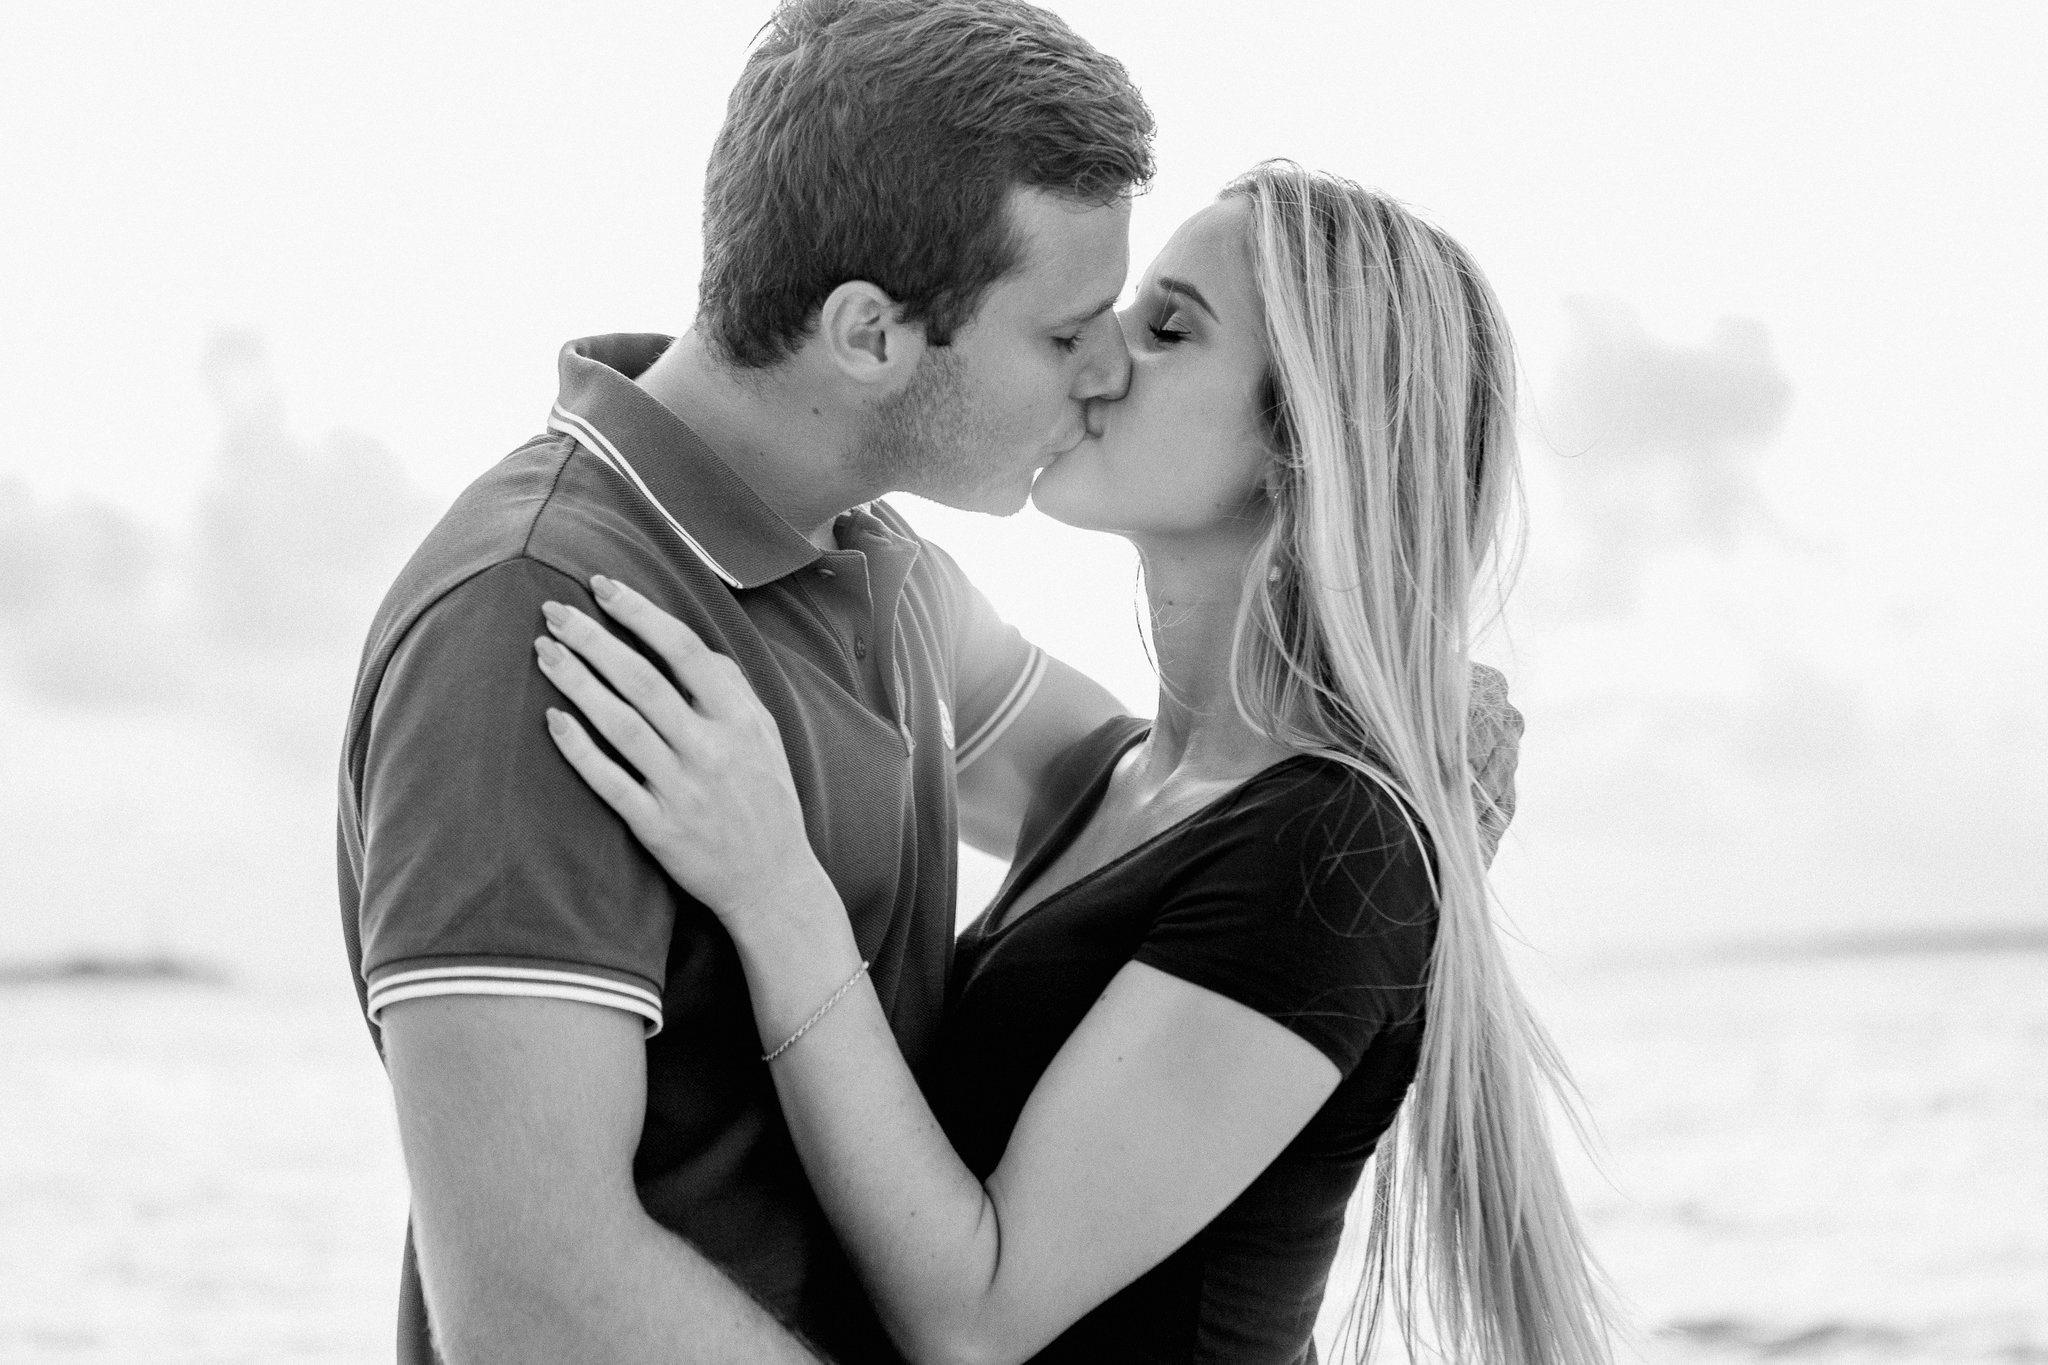 056-maldives-elopement-photographer.jpg